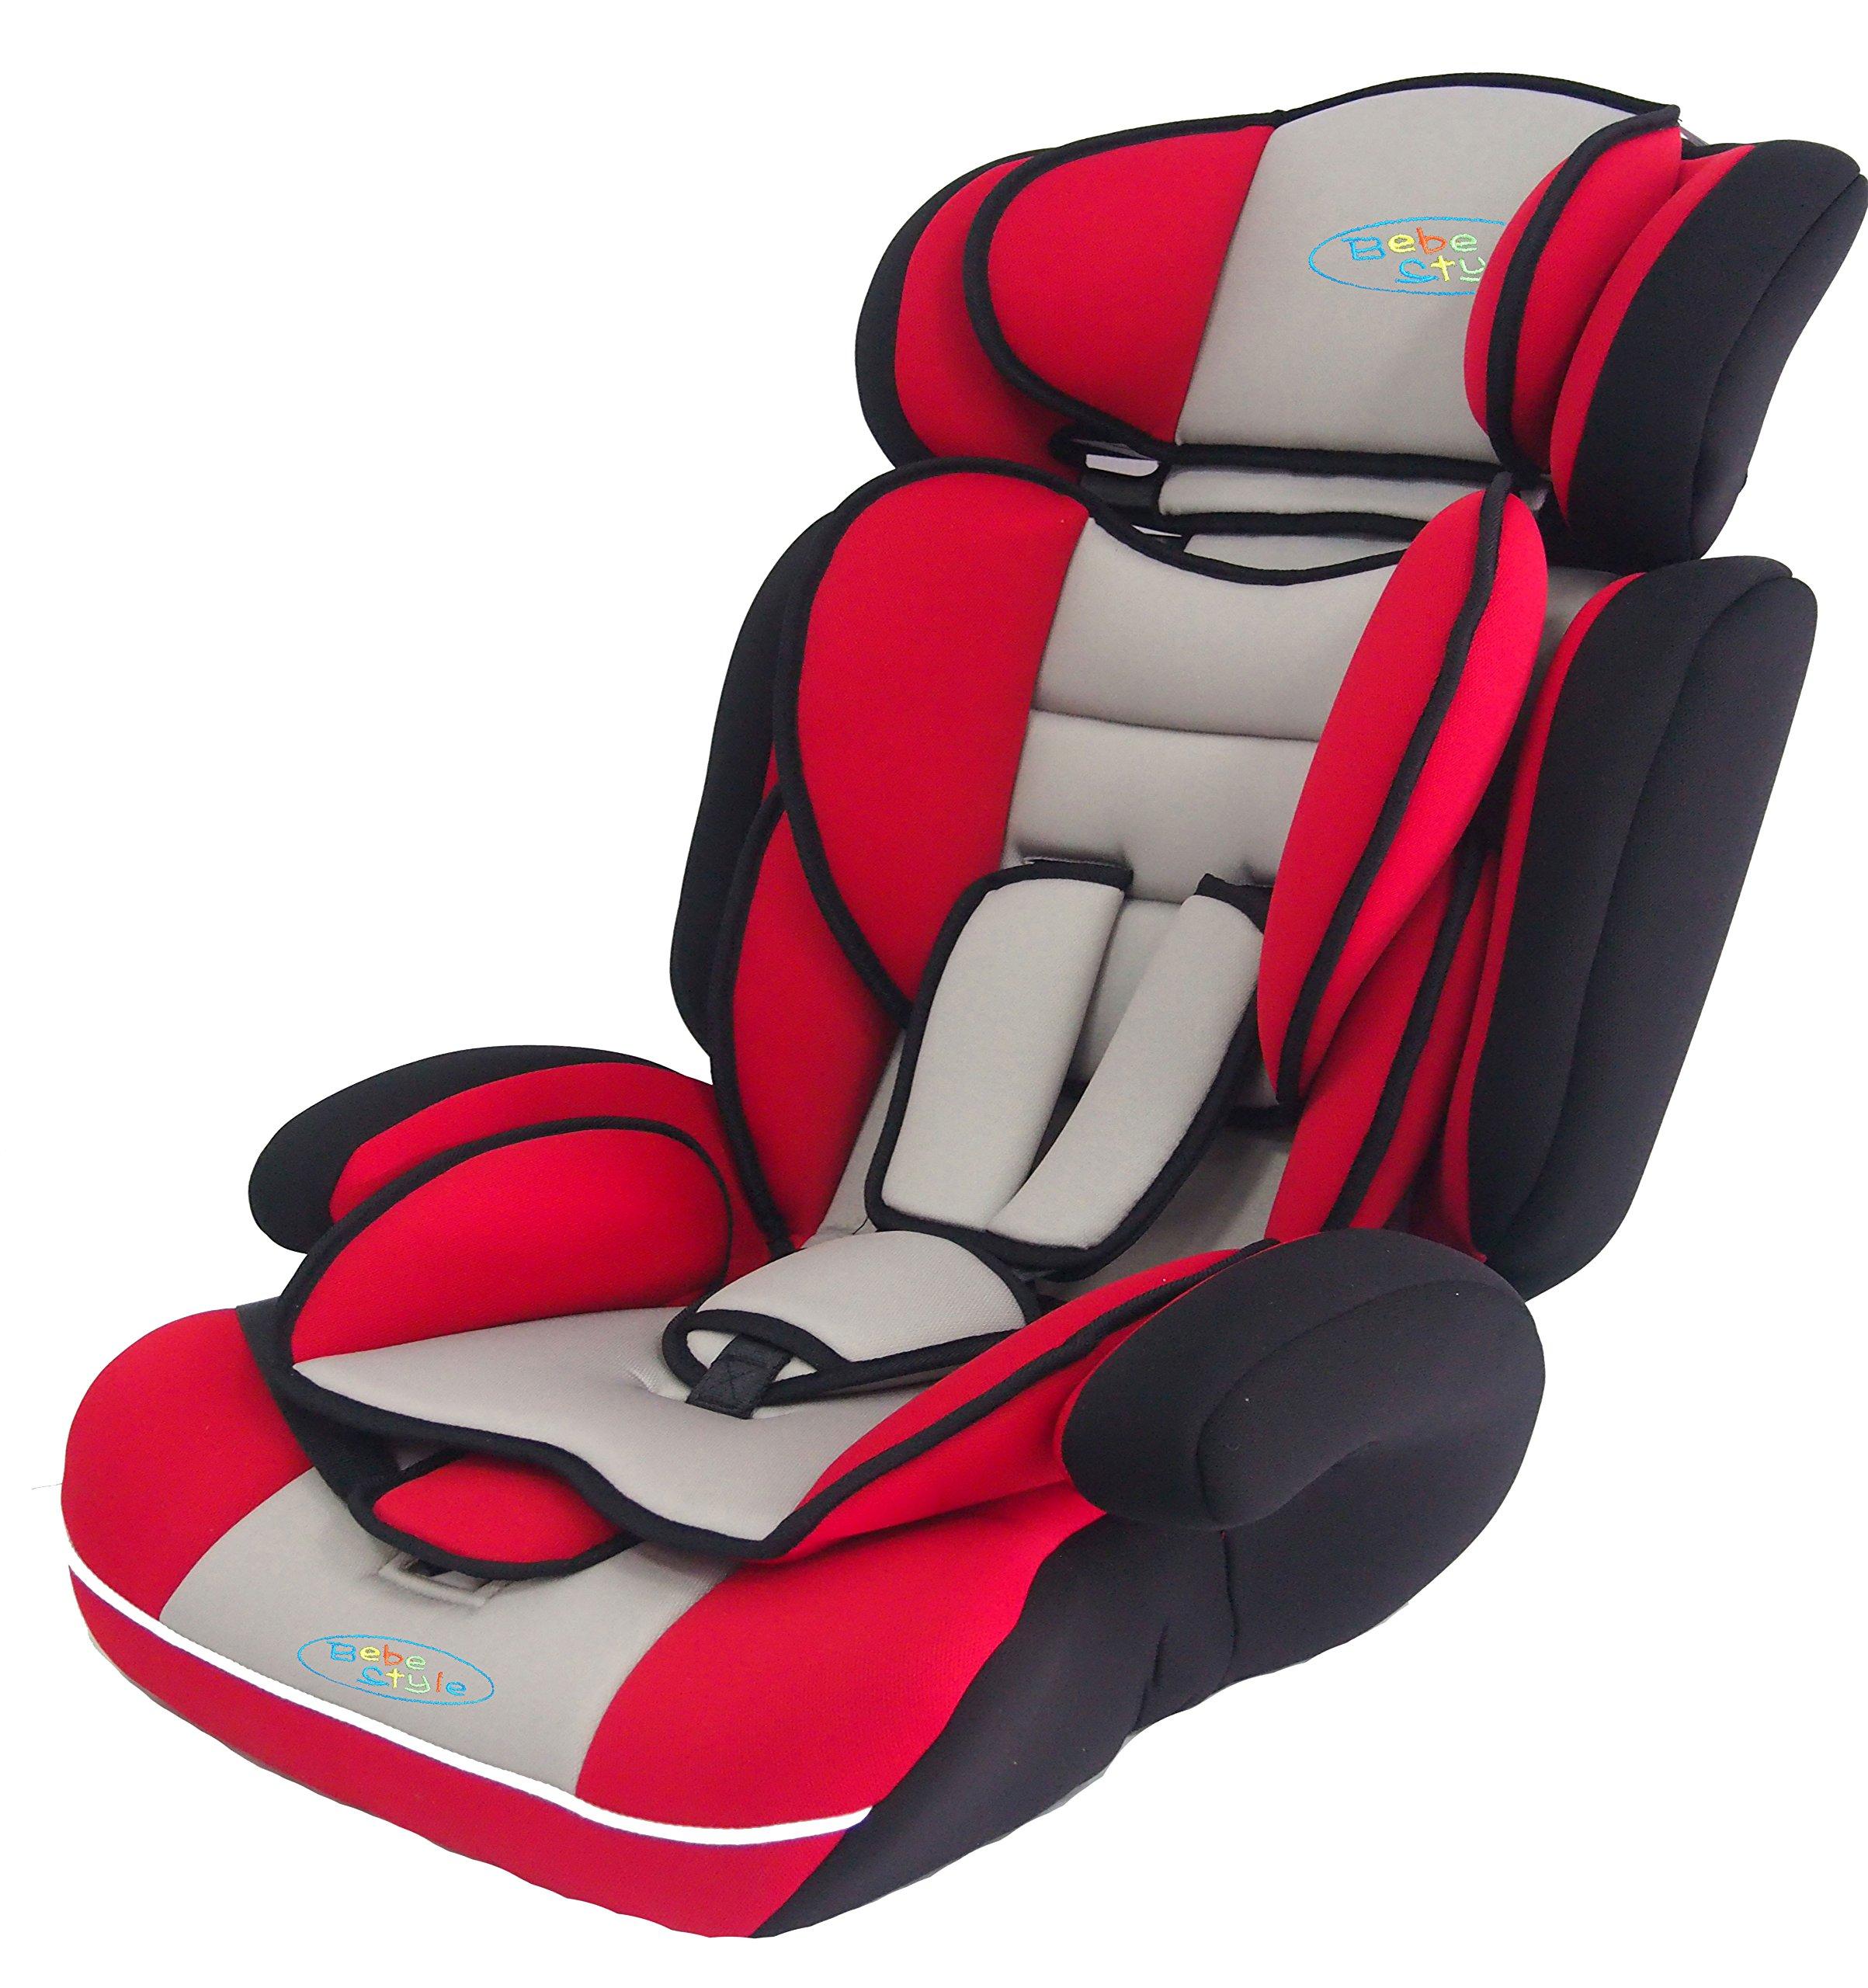 e110d2df1eeb Bebe Style convertible 1/2/3 Combination Car Seat - Red - Babaloo